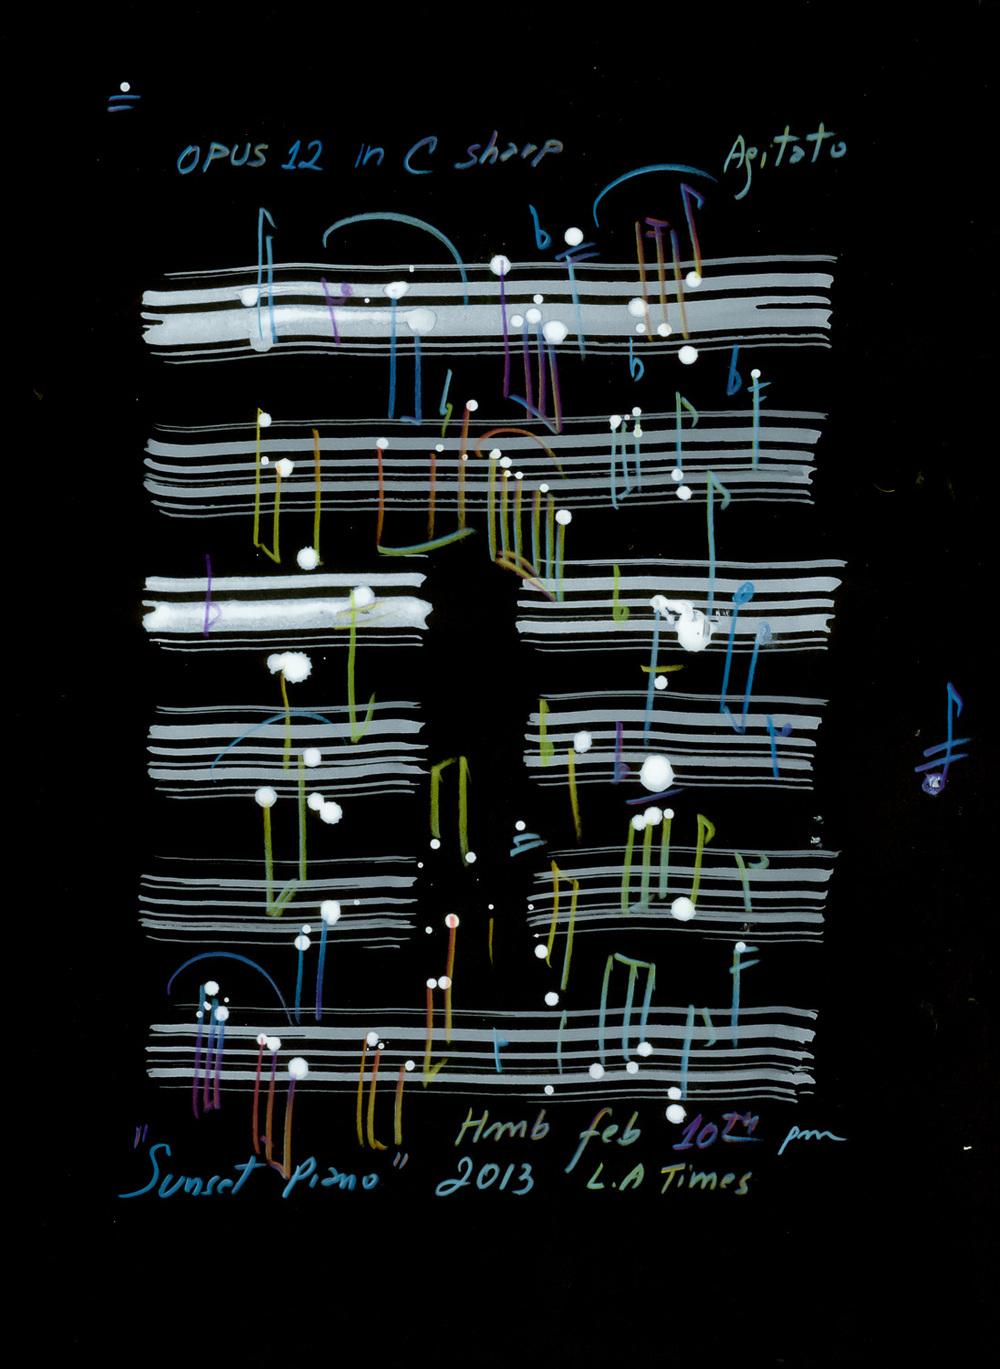 Mauro-Opus1-Notation-11.jpg